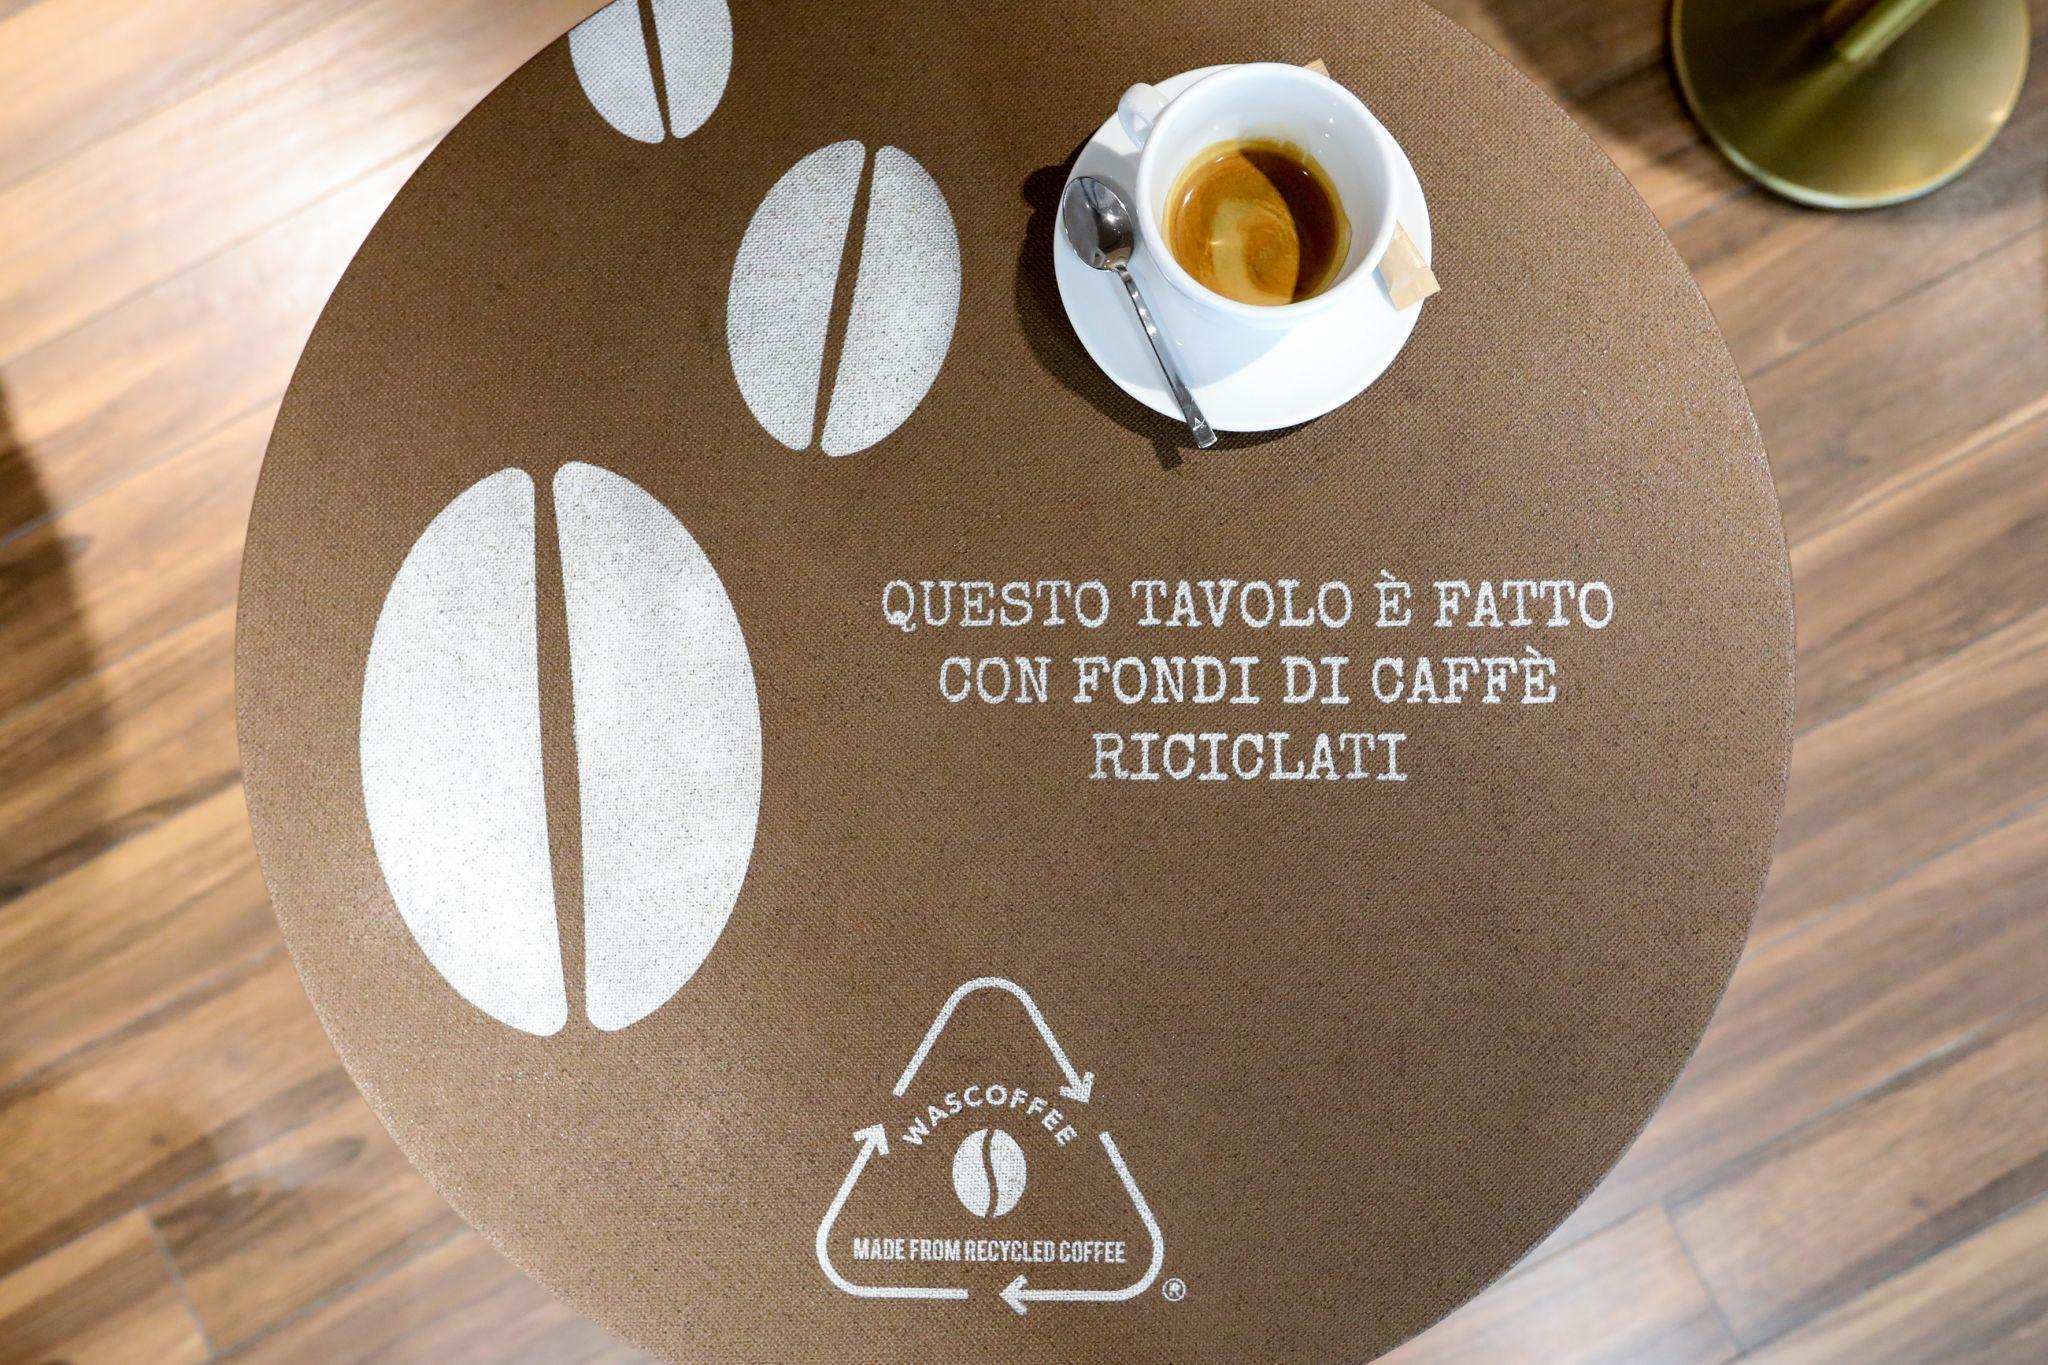 wascoffee - Pepite per Tutti1